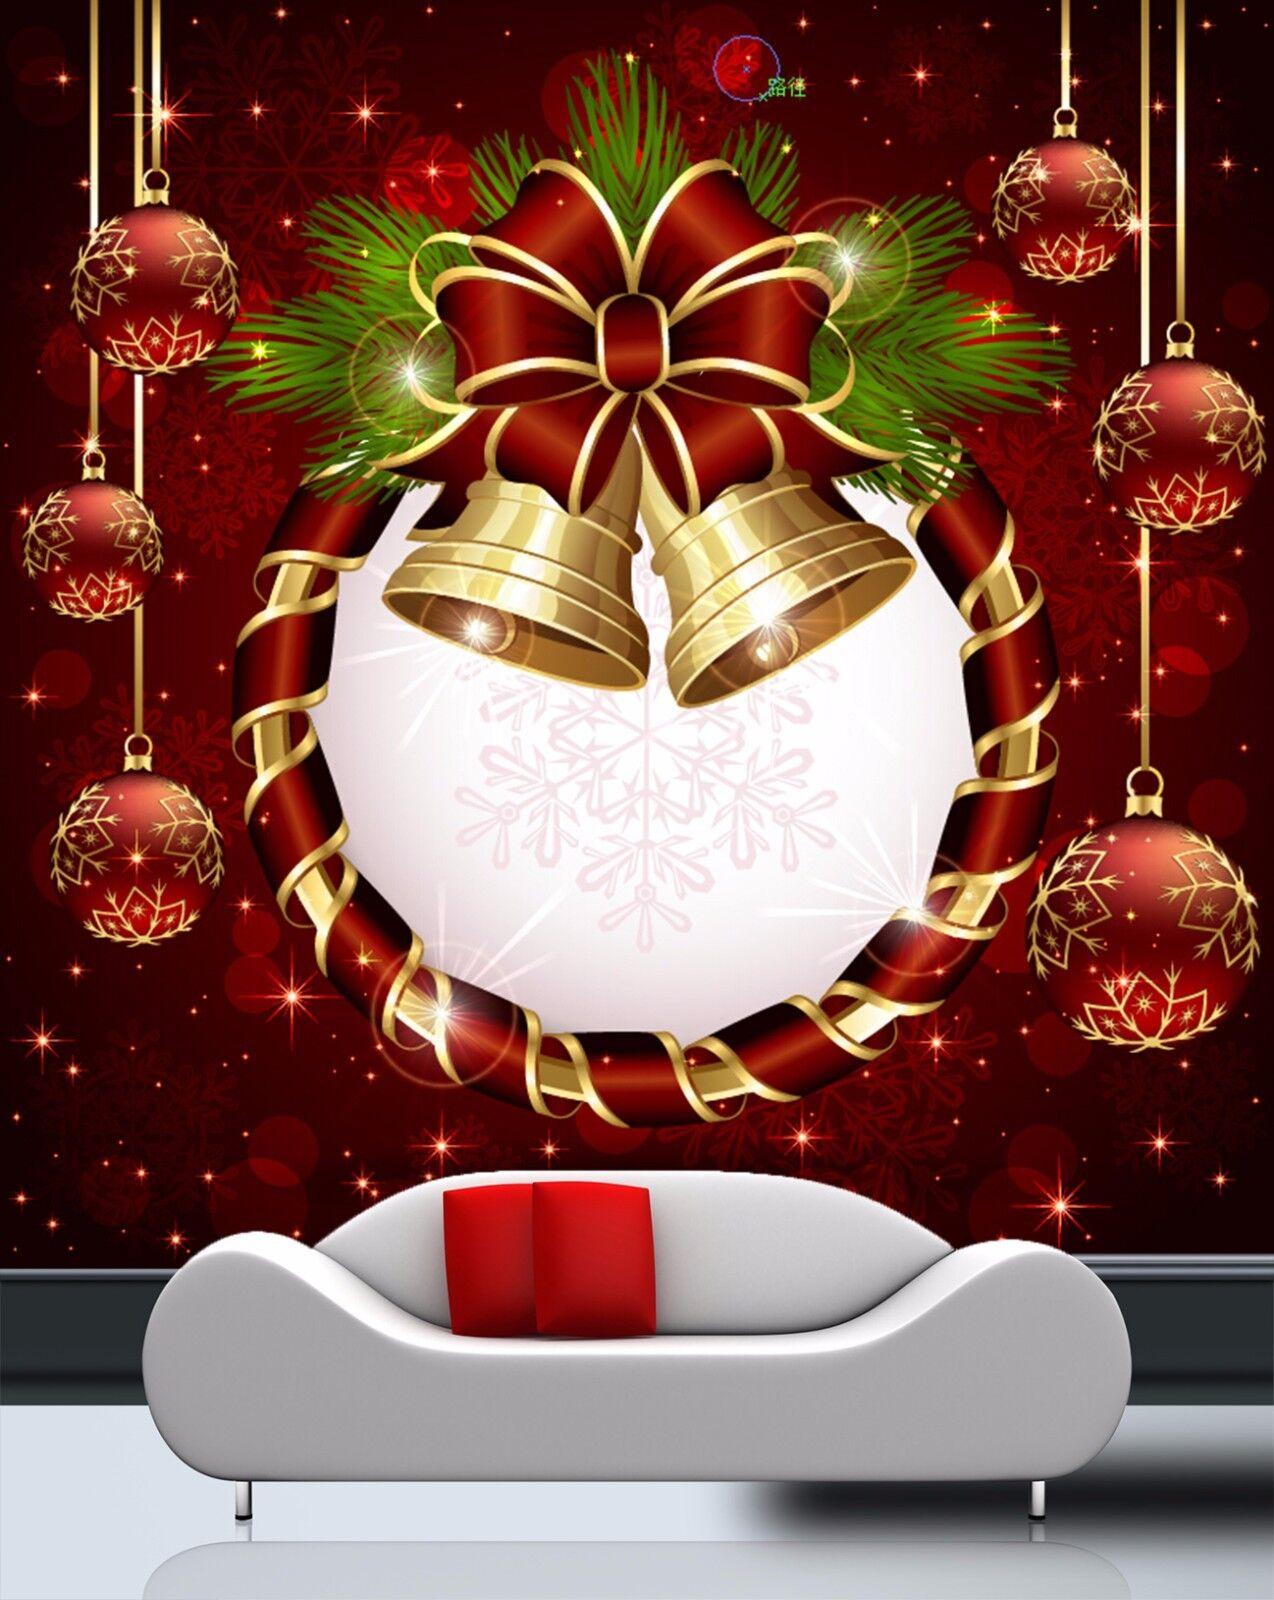 3D Holiday Ornaments 74 Wallpaper Mural Paper Wall Print Wallpaper Murals Lemon